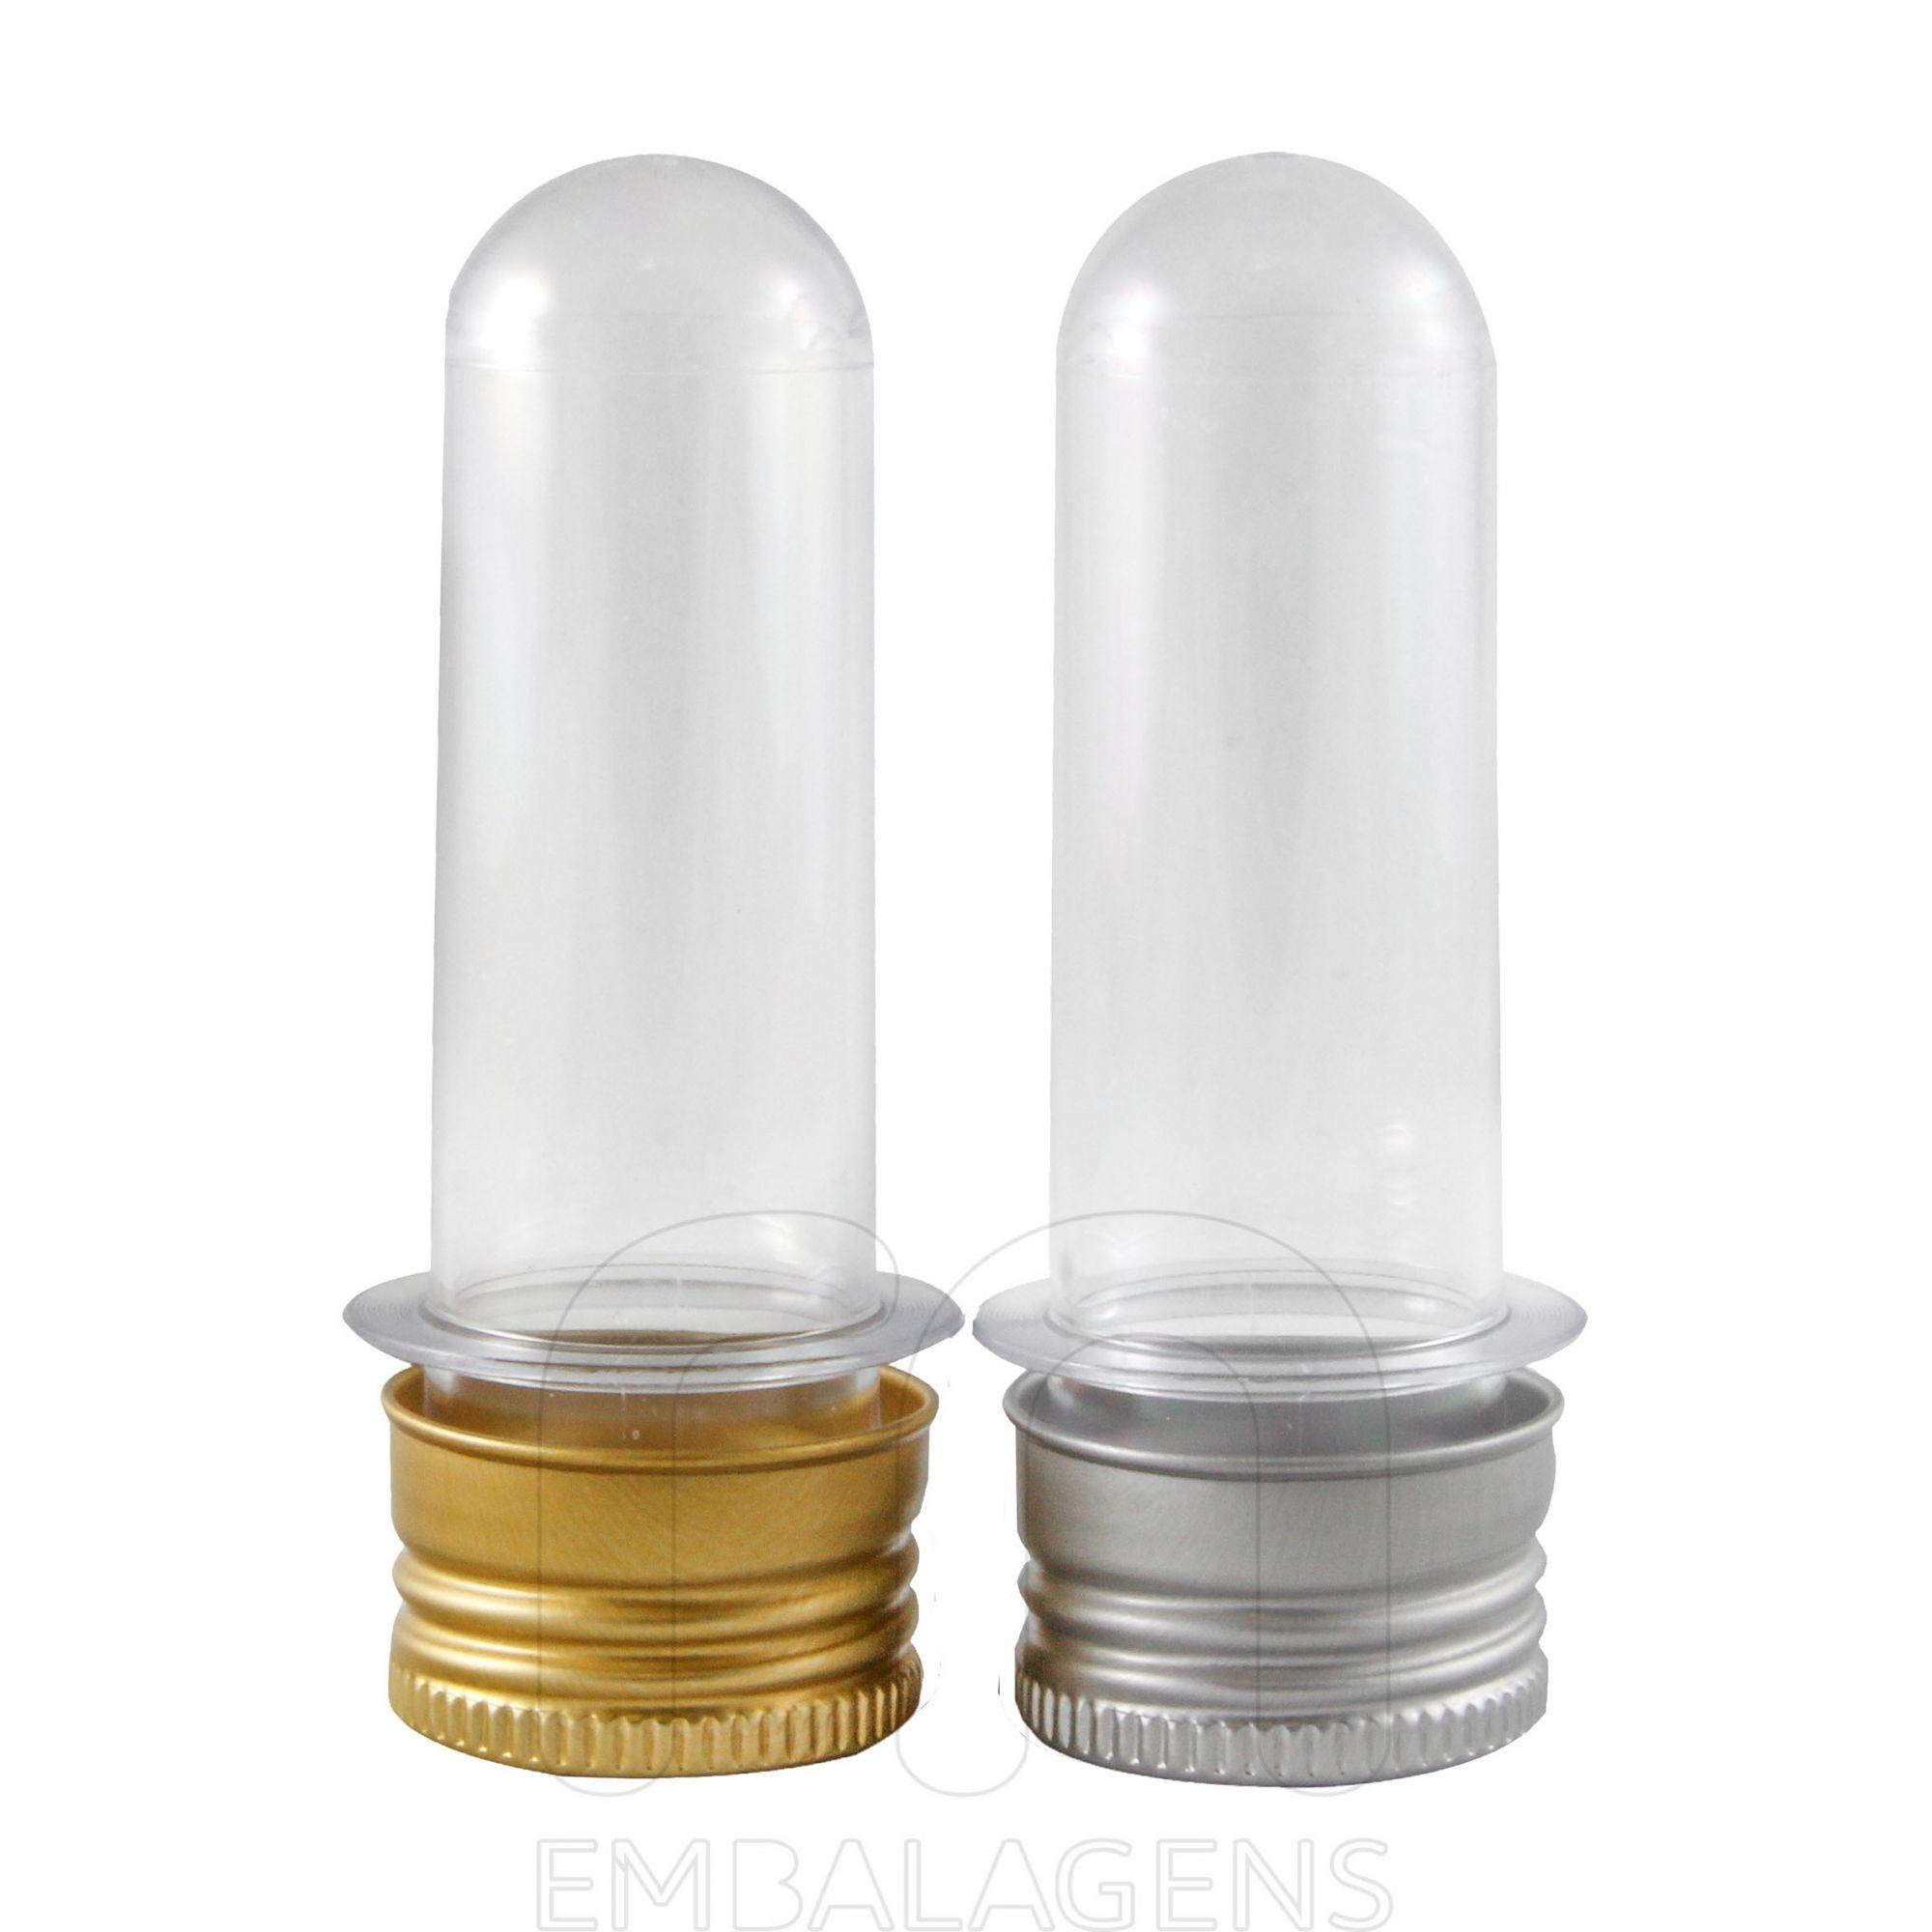 Tubetes para lembrancinha 8 cm tampa de Metal kit com 10 unidades